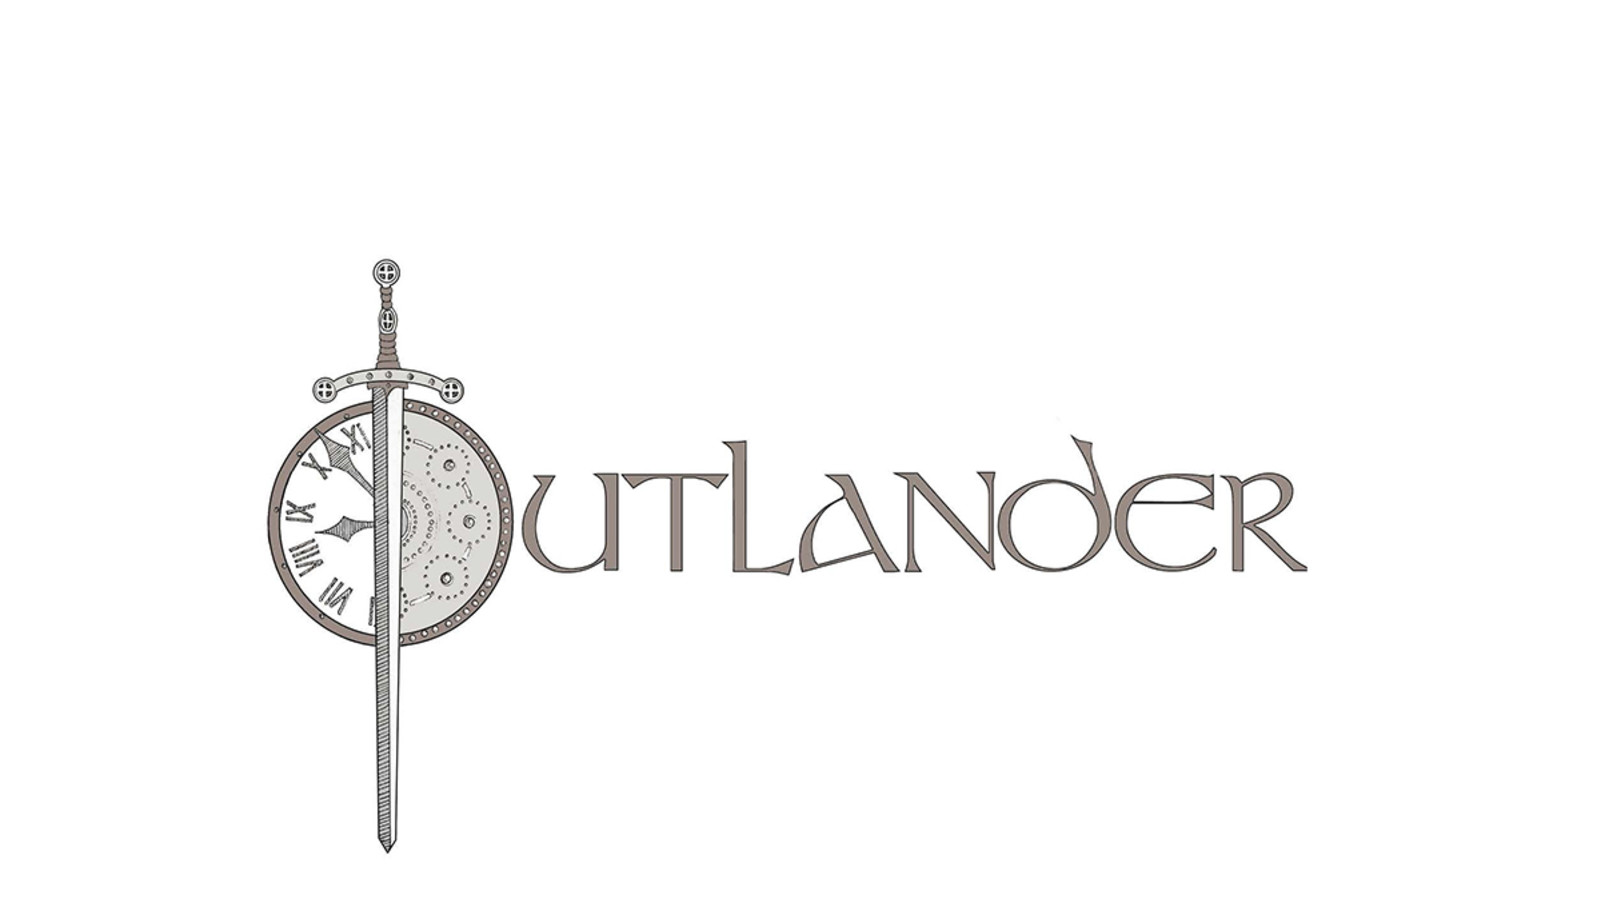 Outlander Community